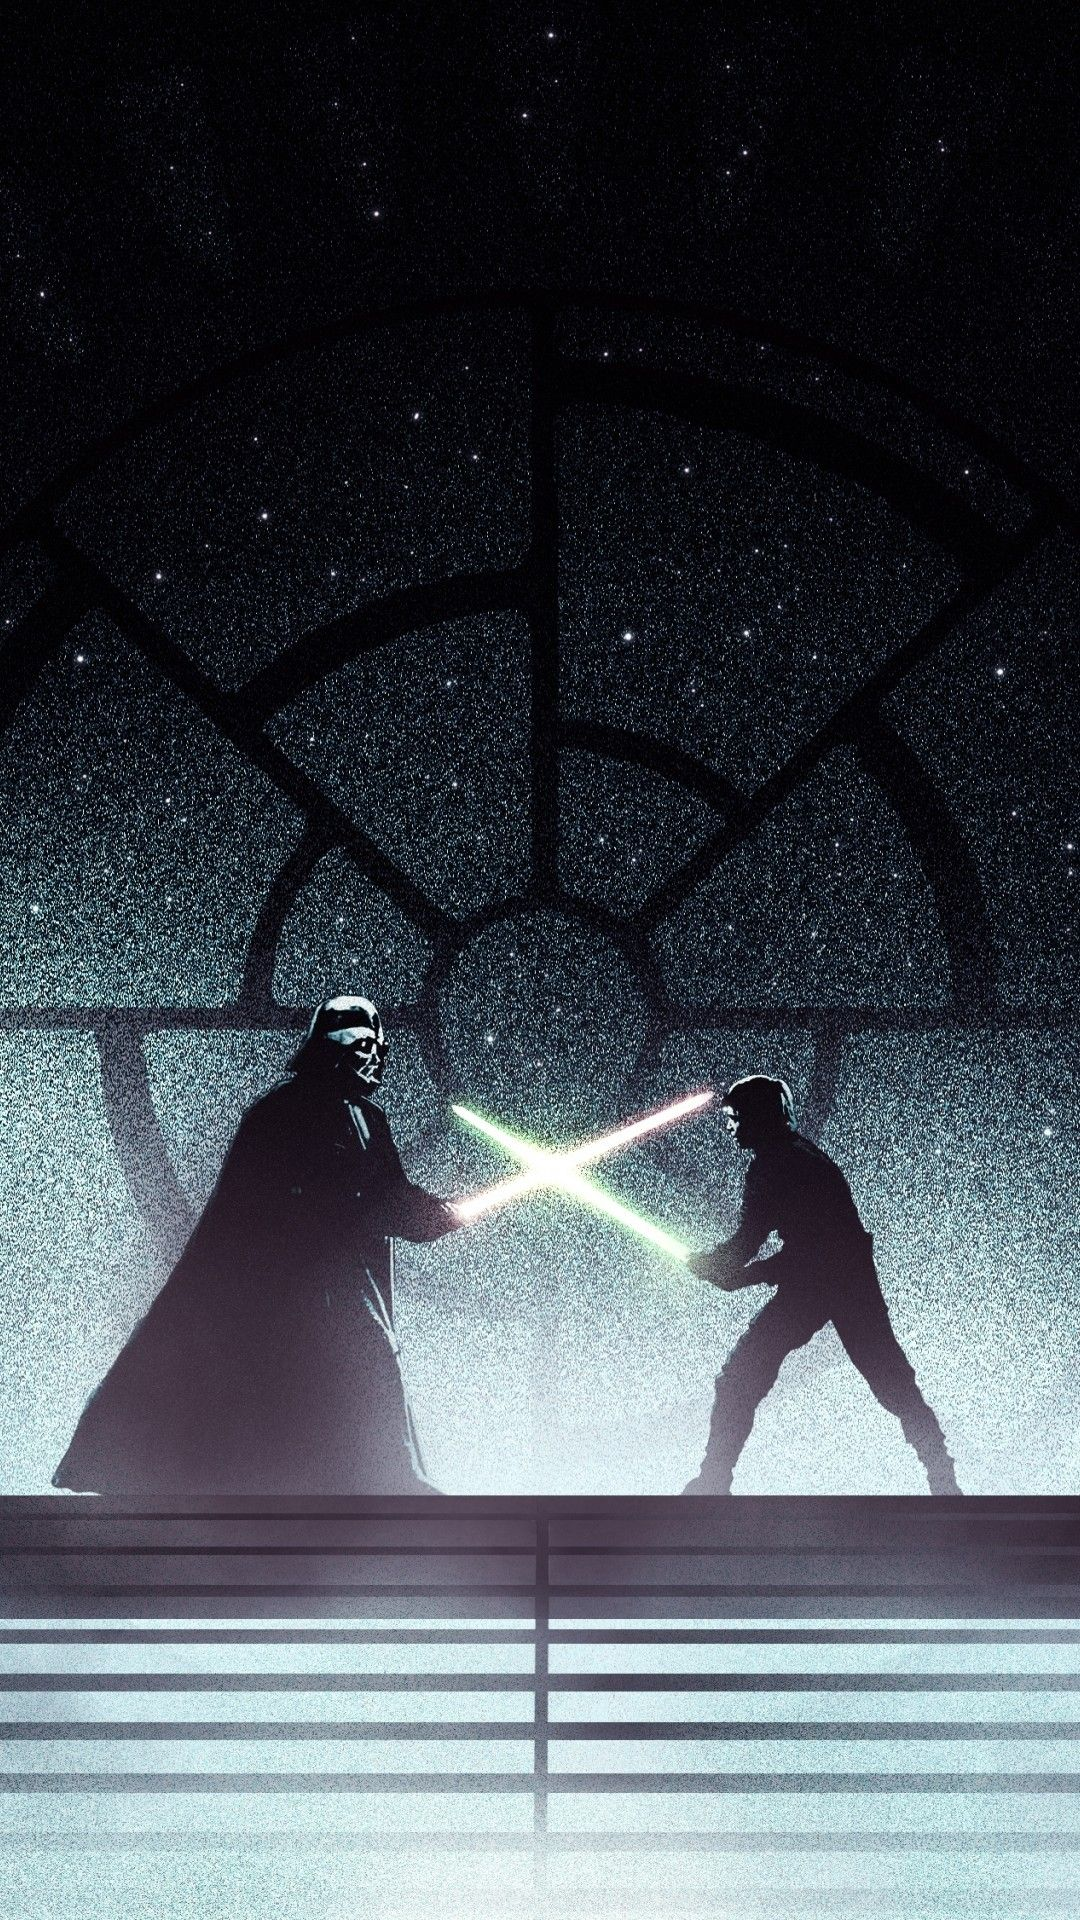 Star Wars High Resolution Wallpaper Star Wars Background Star Wars Wallpaper Star Wars Painting